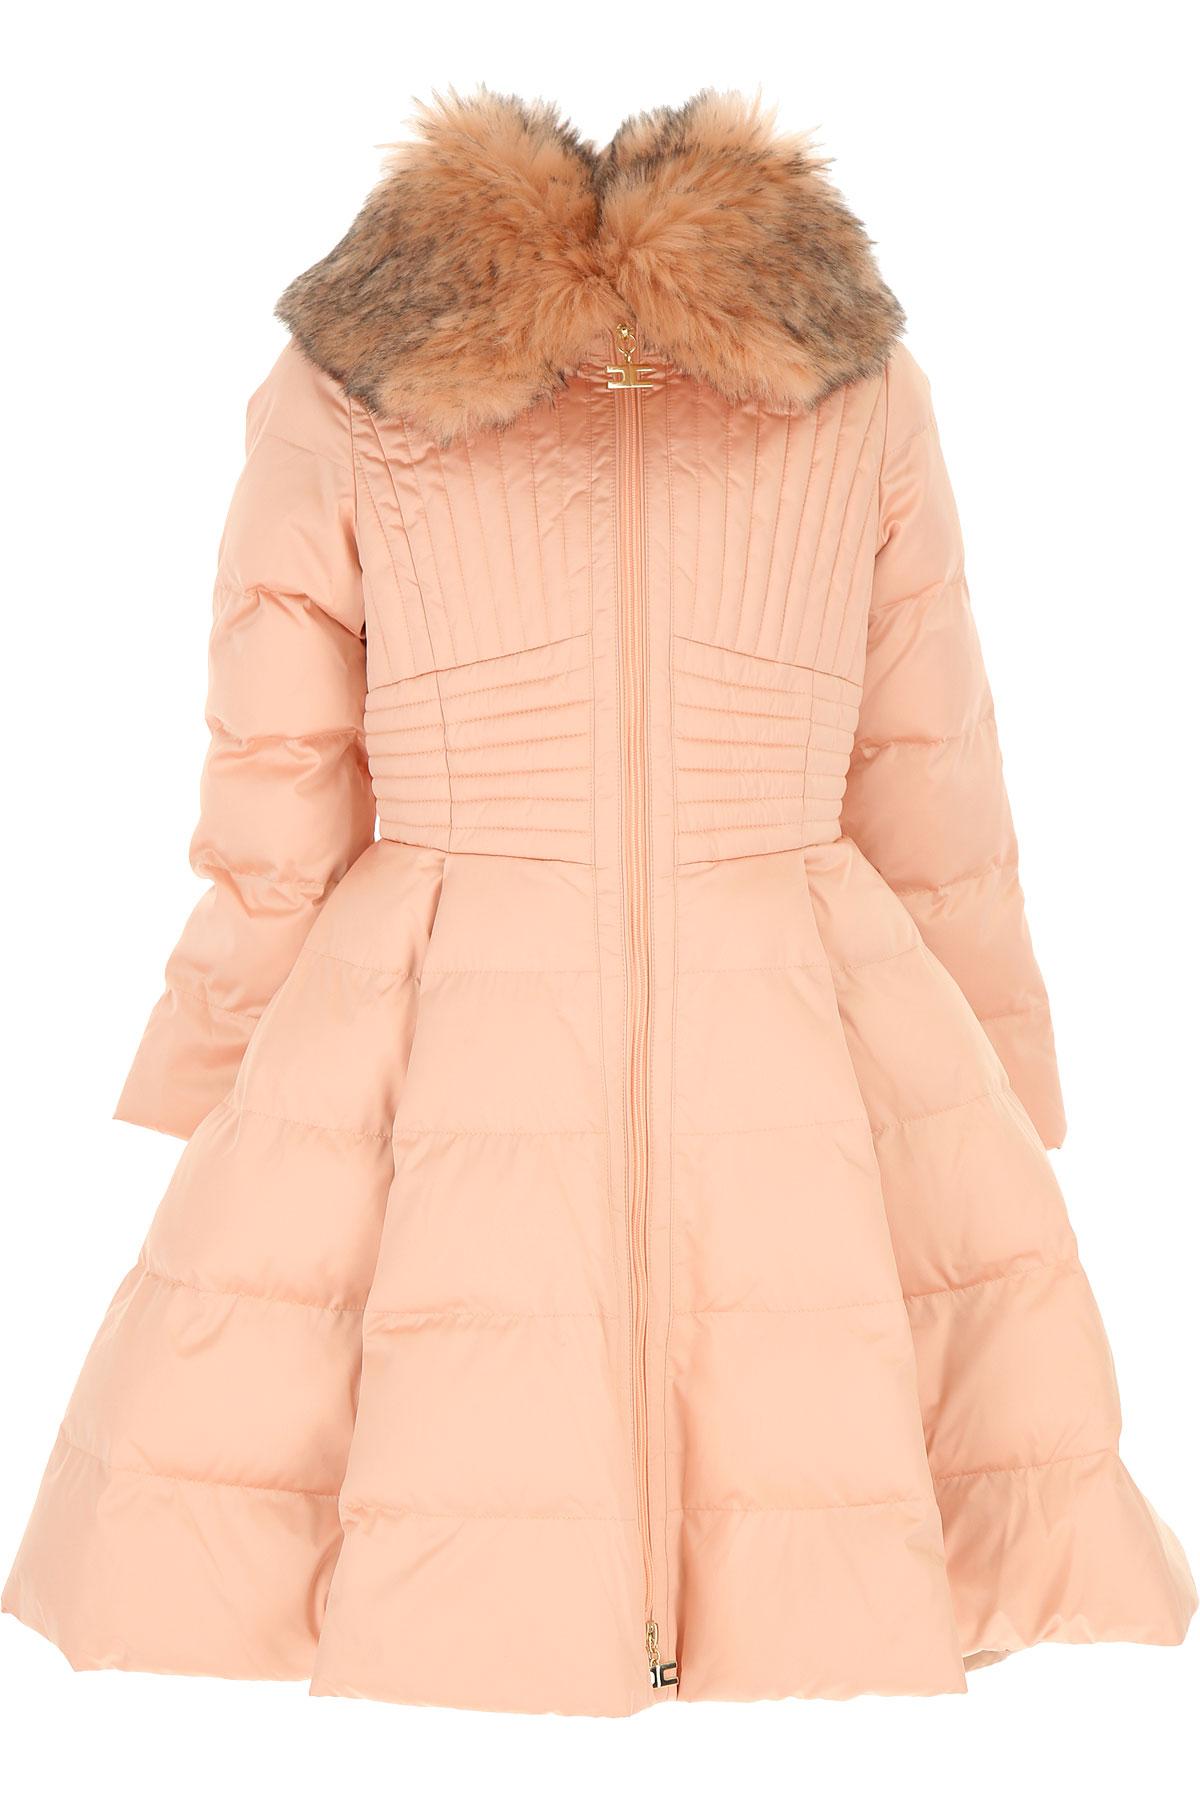 Elisabetta Franchi Girls Down Jacket for Kids, Puffer Ski Jacket On Sale, Pink, polyester, 2019, M XL